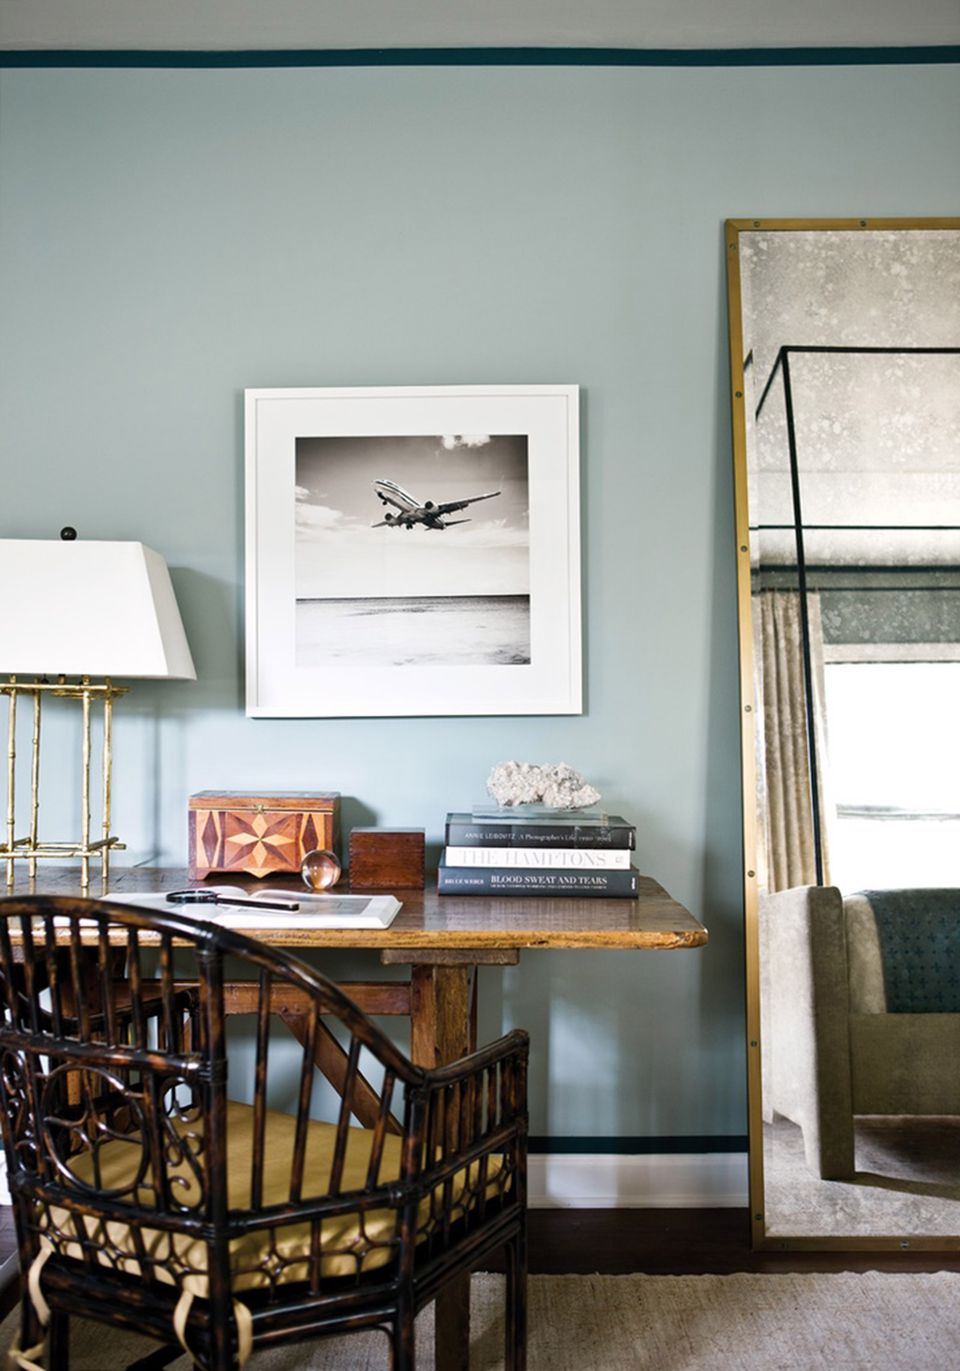 5 best interior paint brands - Interior painting company atlanta ga ...